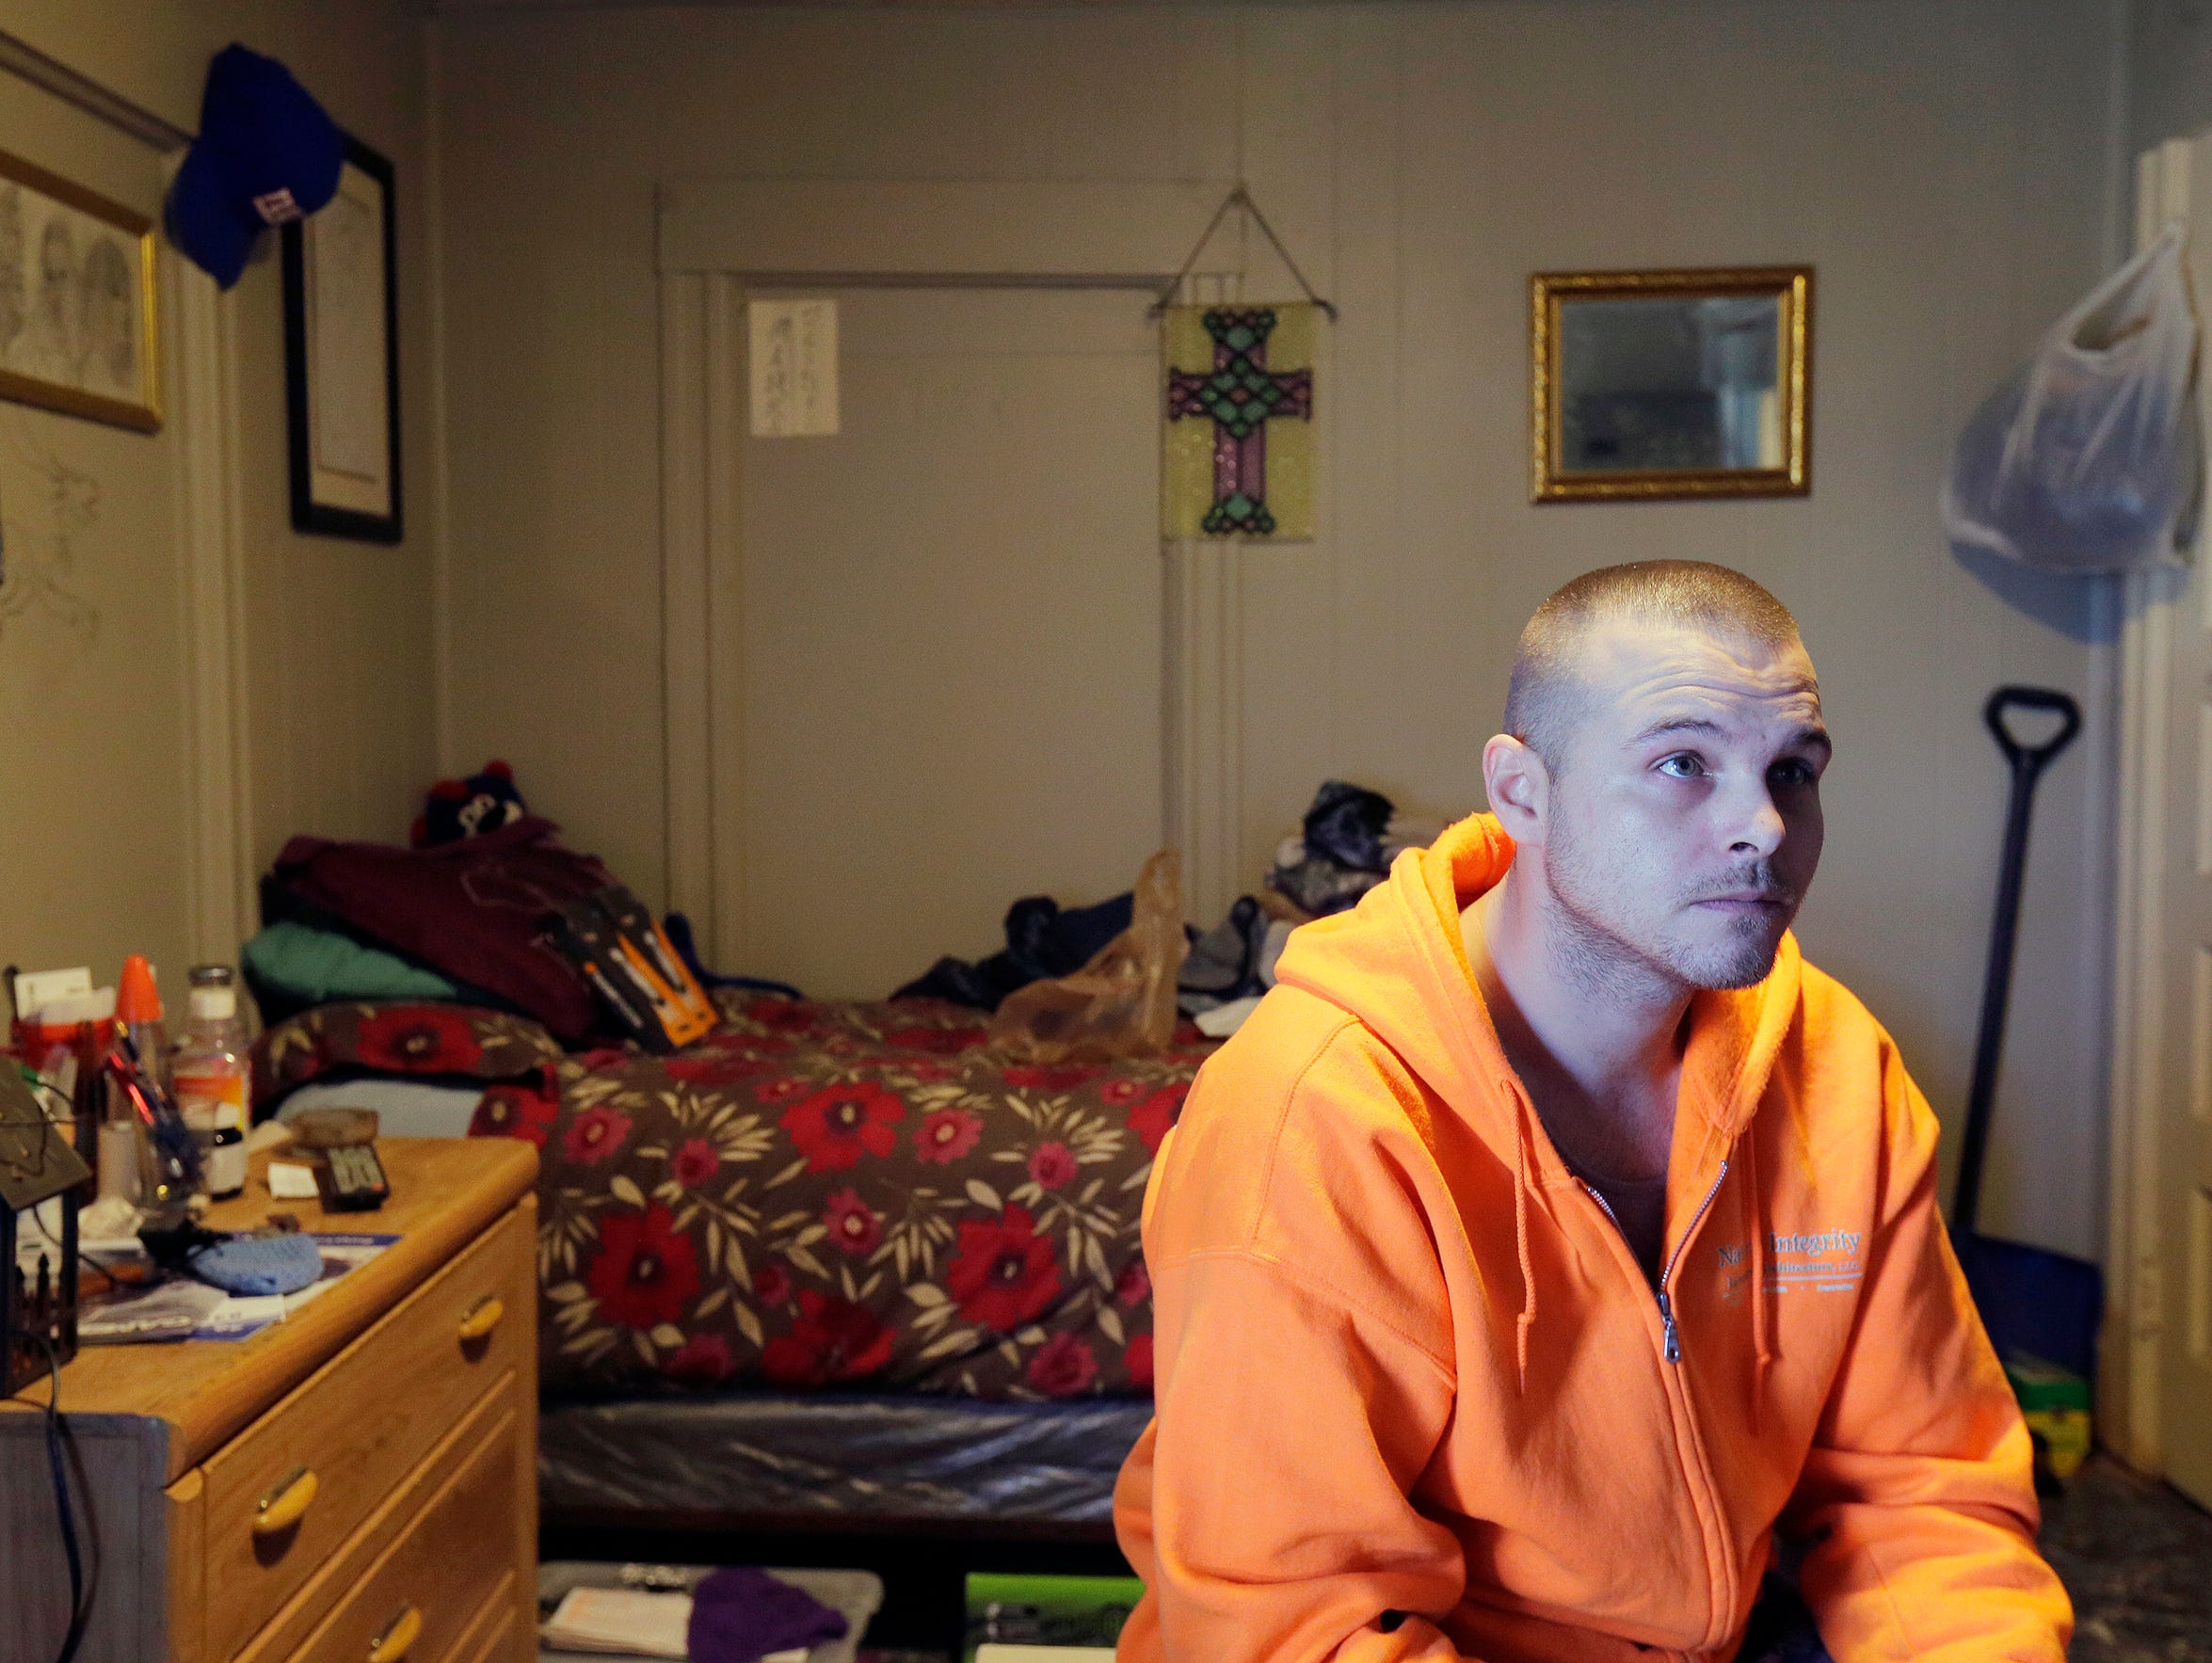 Mark VanDerveer, 33, a resident of the Delmonte Hotel,